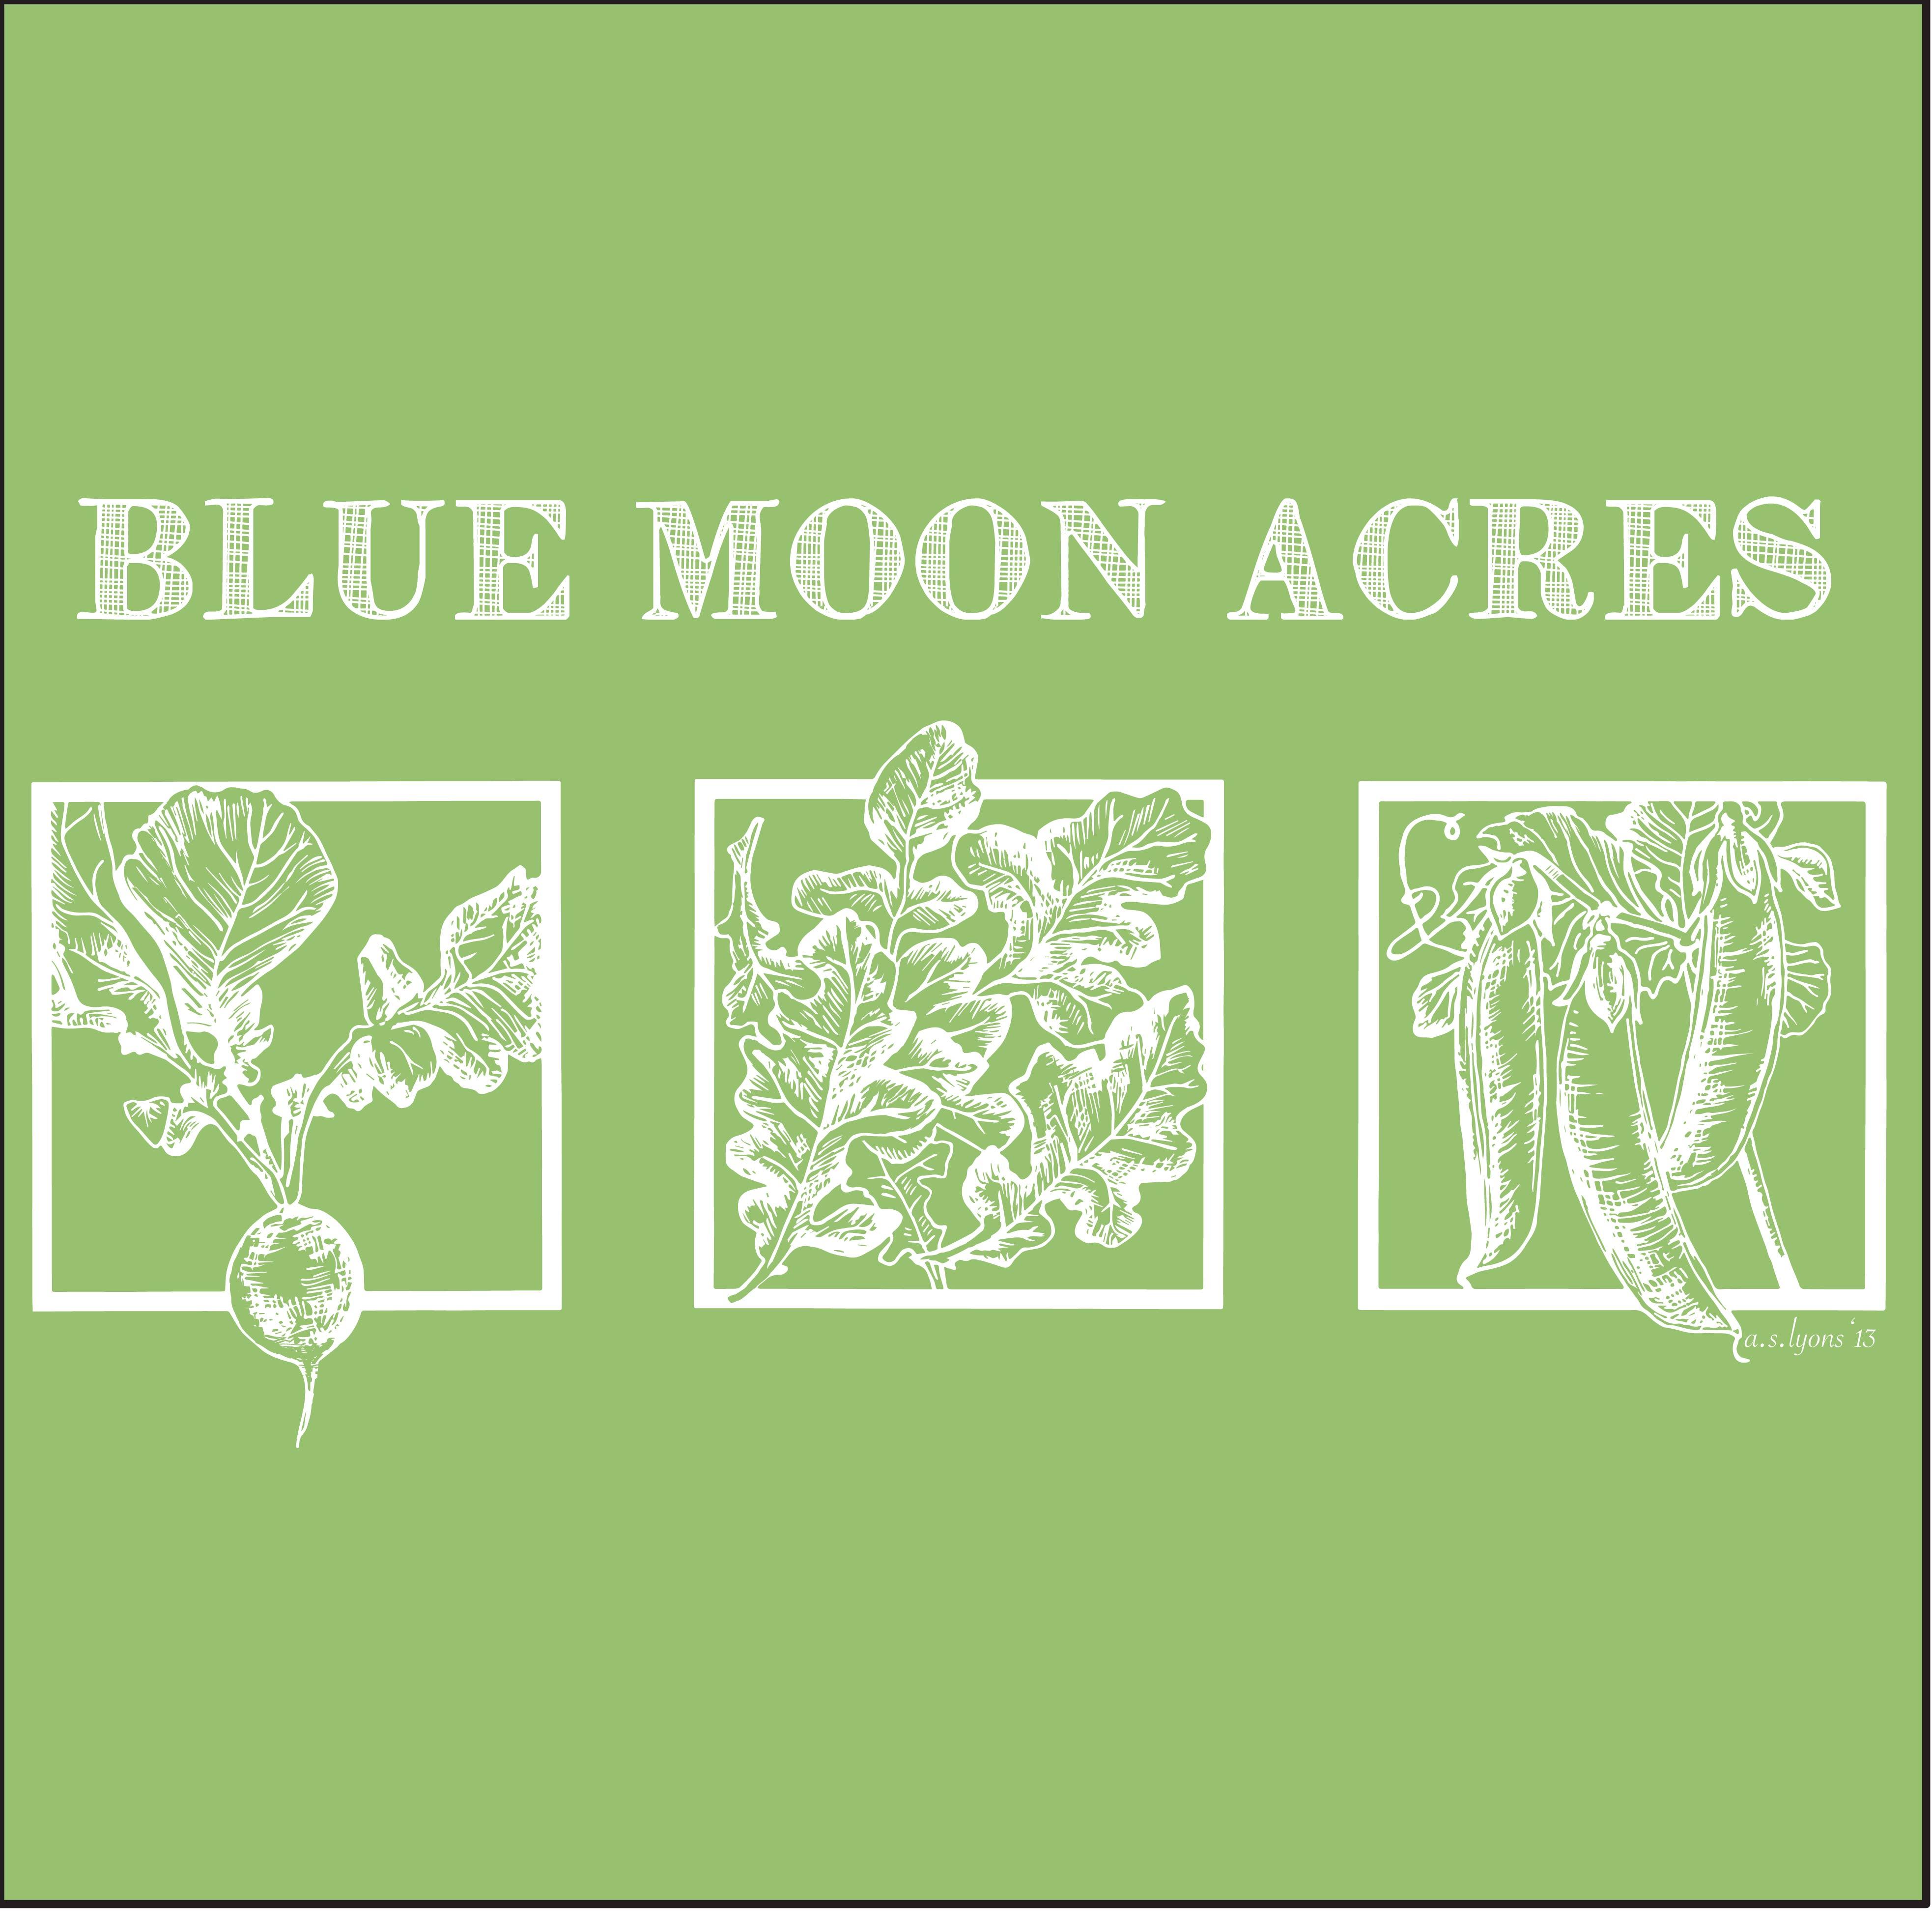 Blue Moon Acres print